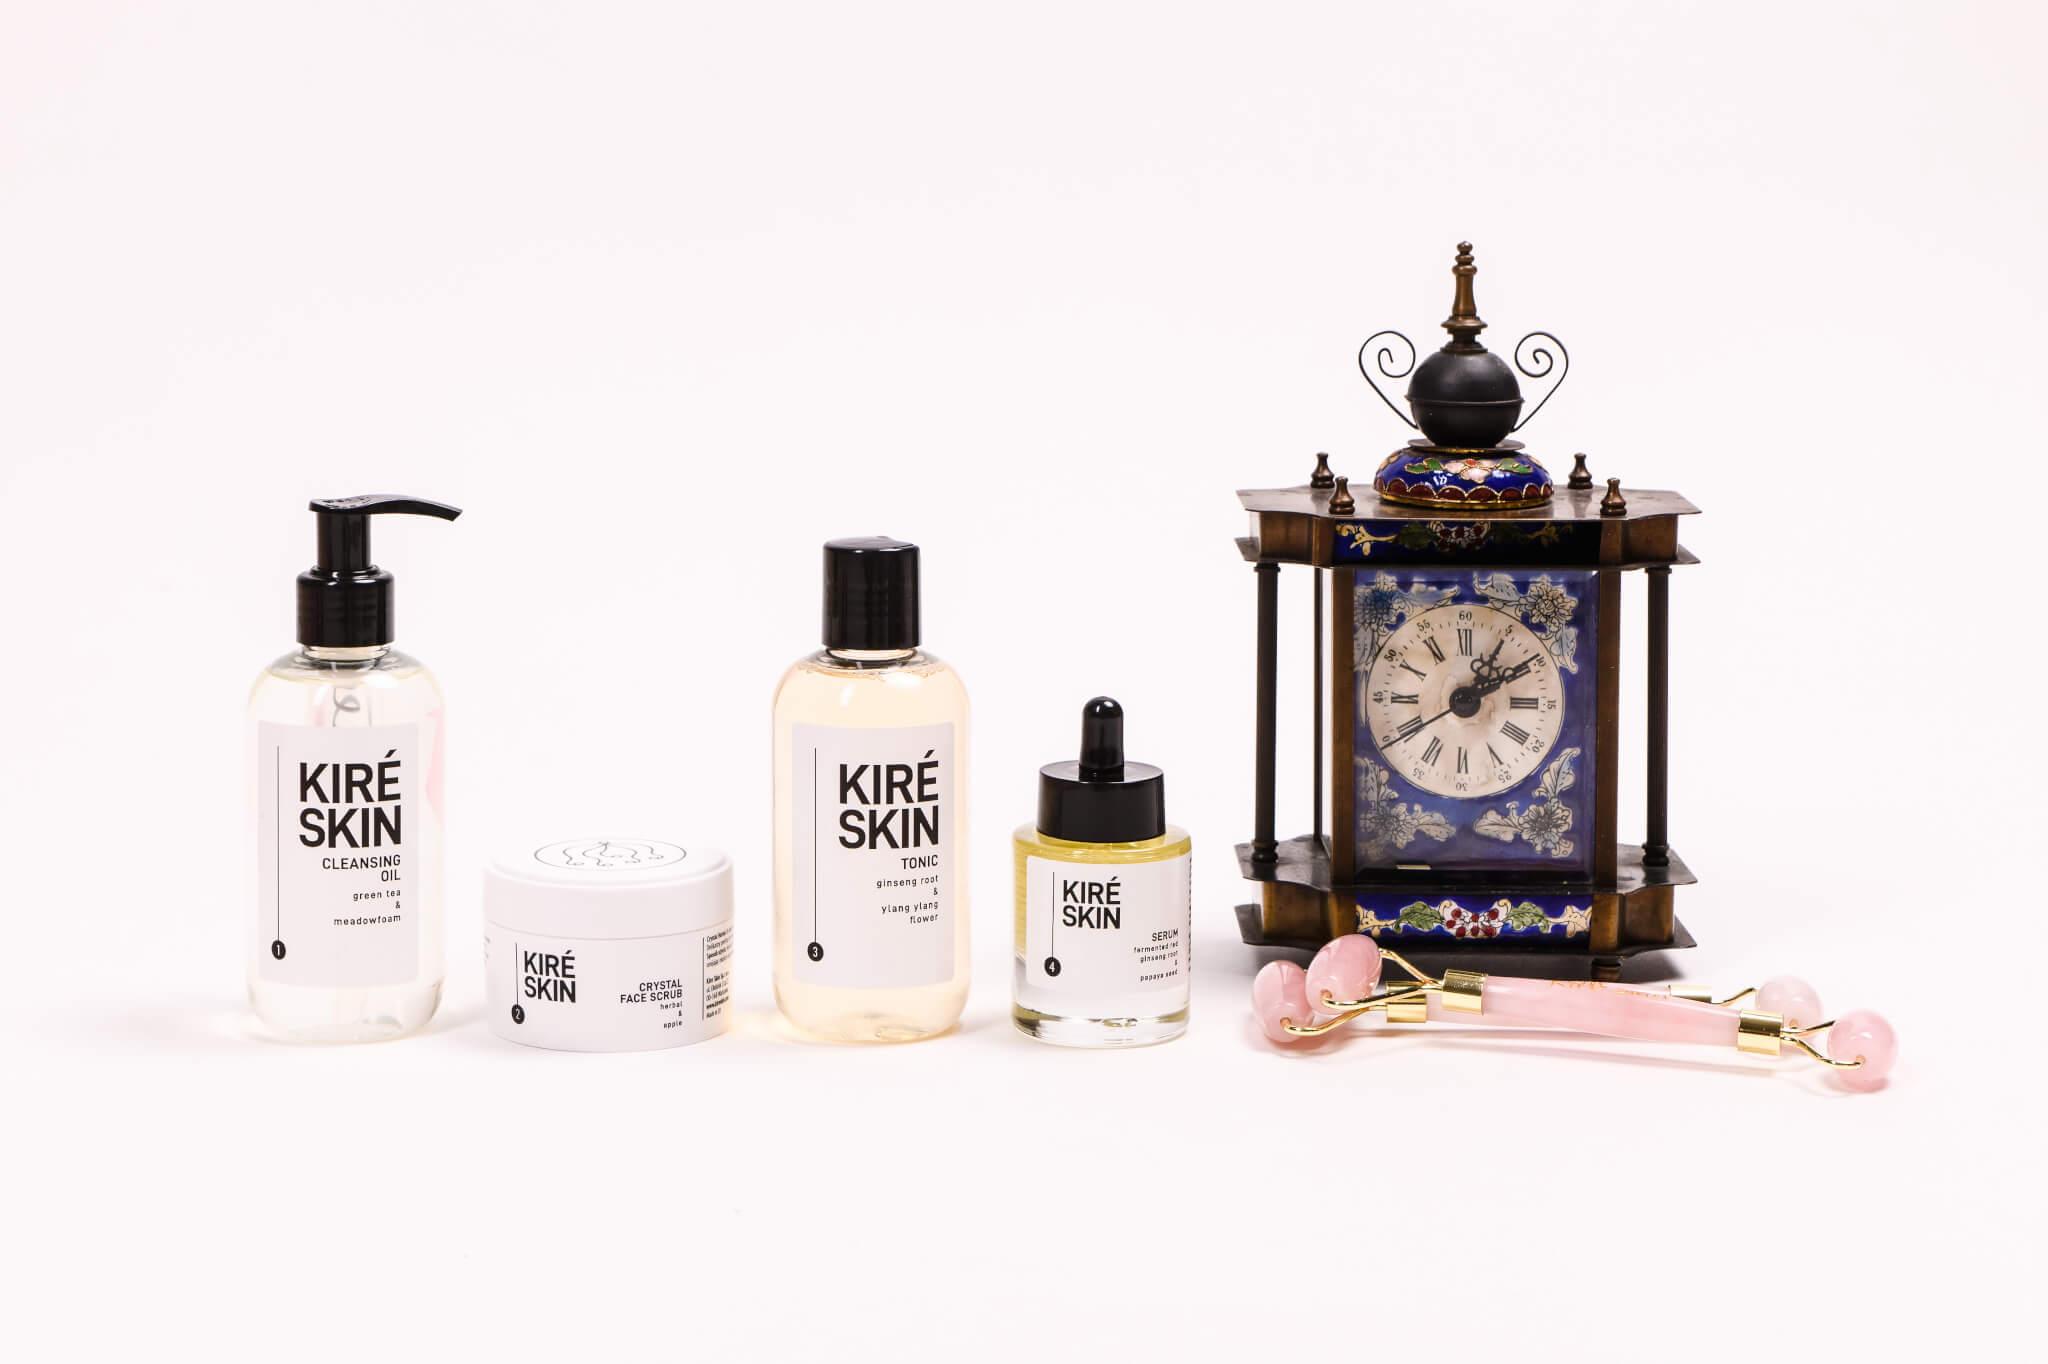 paquetería de Kiré Skin